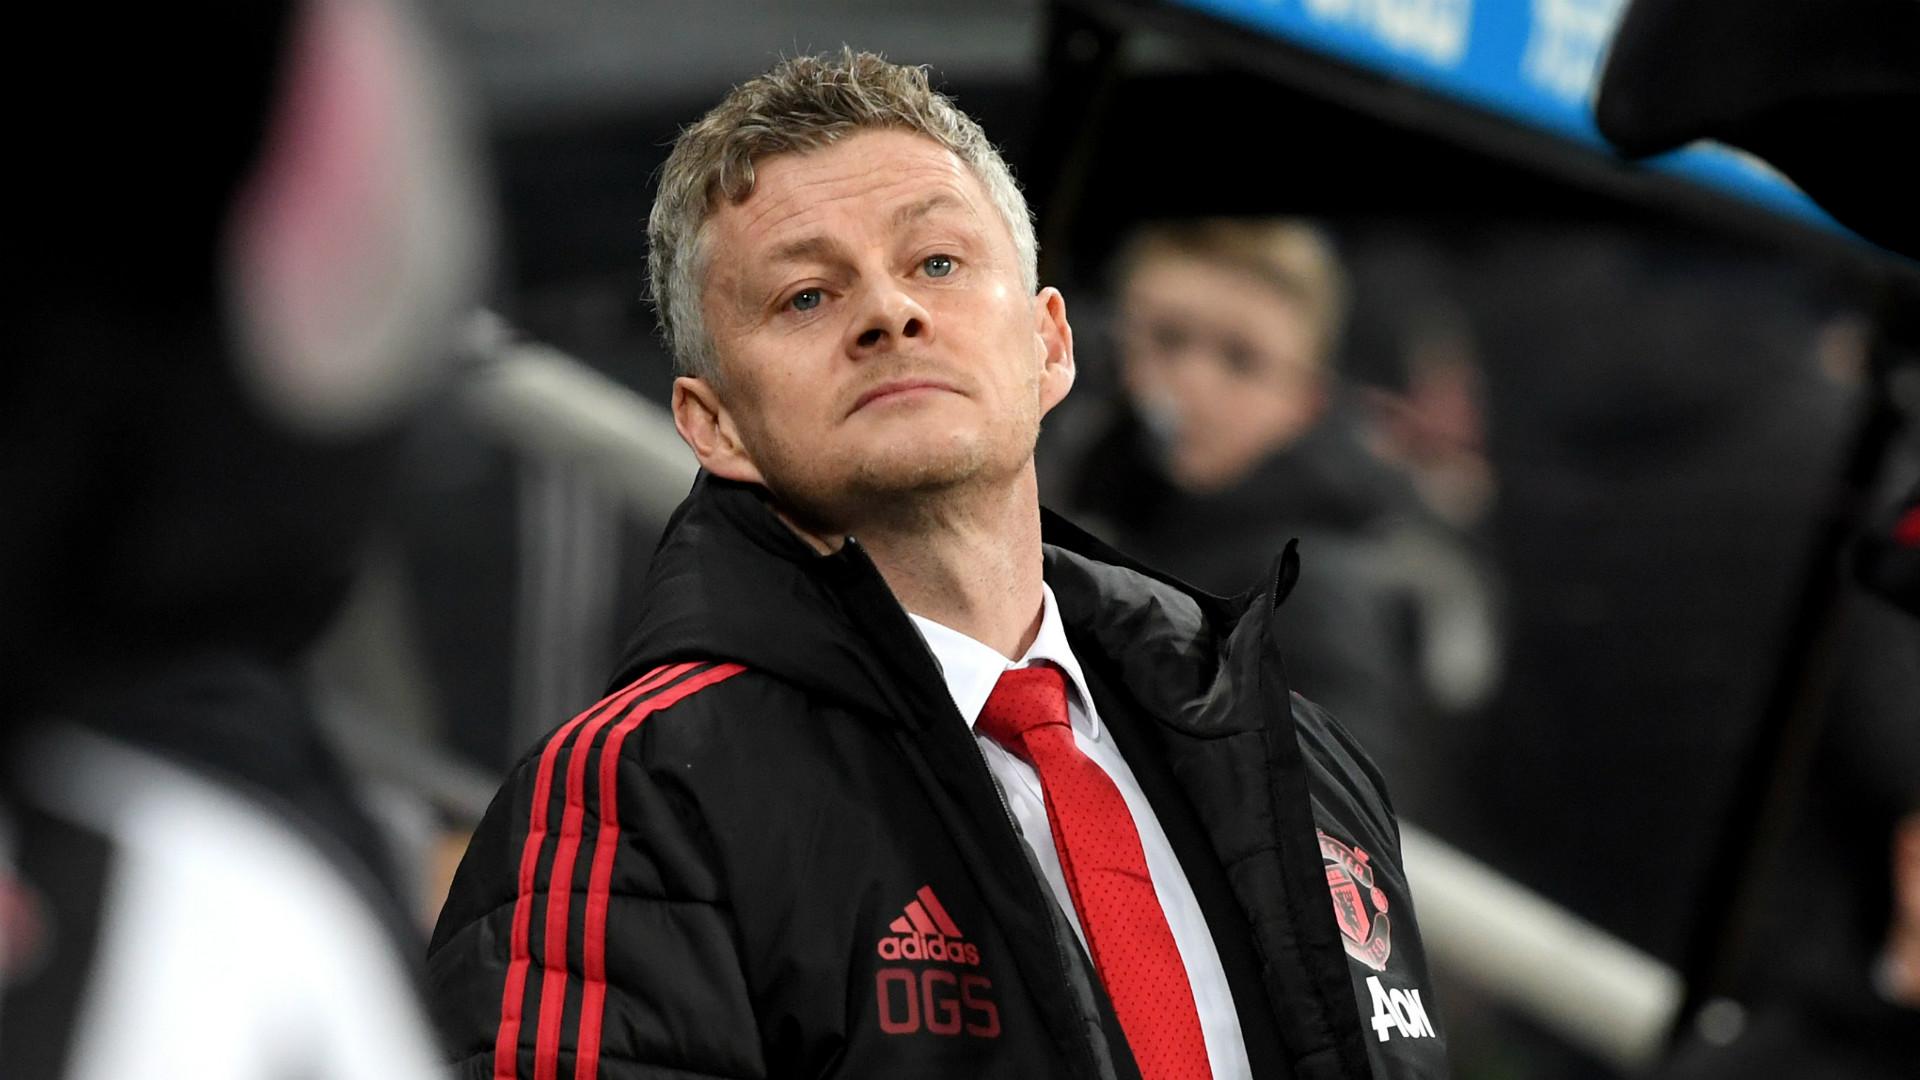 Ole Gunnar Solskjaer has found his best team before Manchester United vs Spurs - Bóng Đá